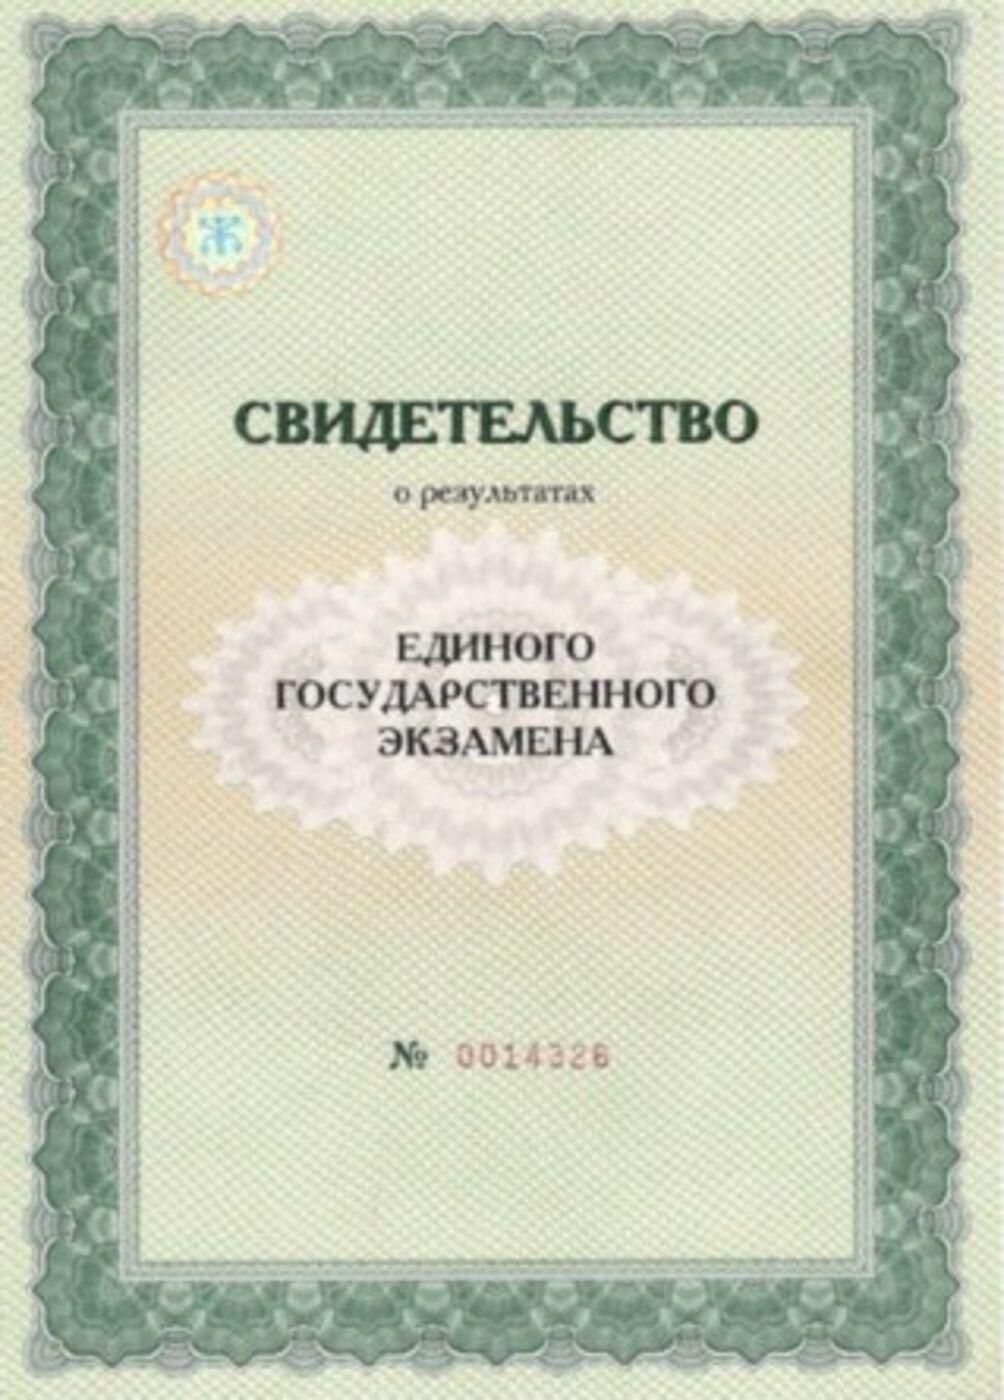 P26 2003